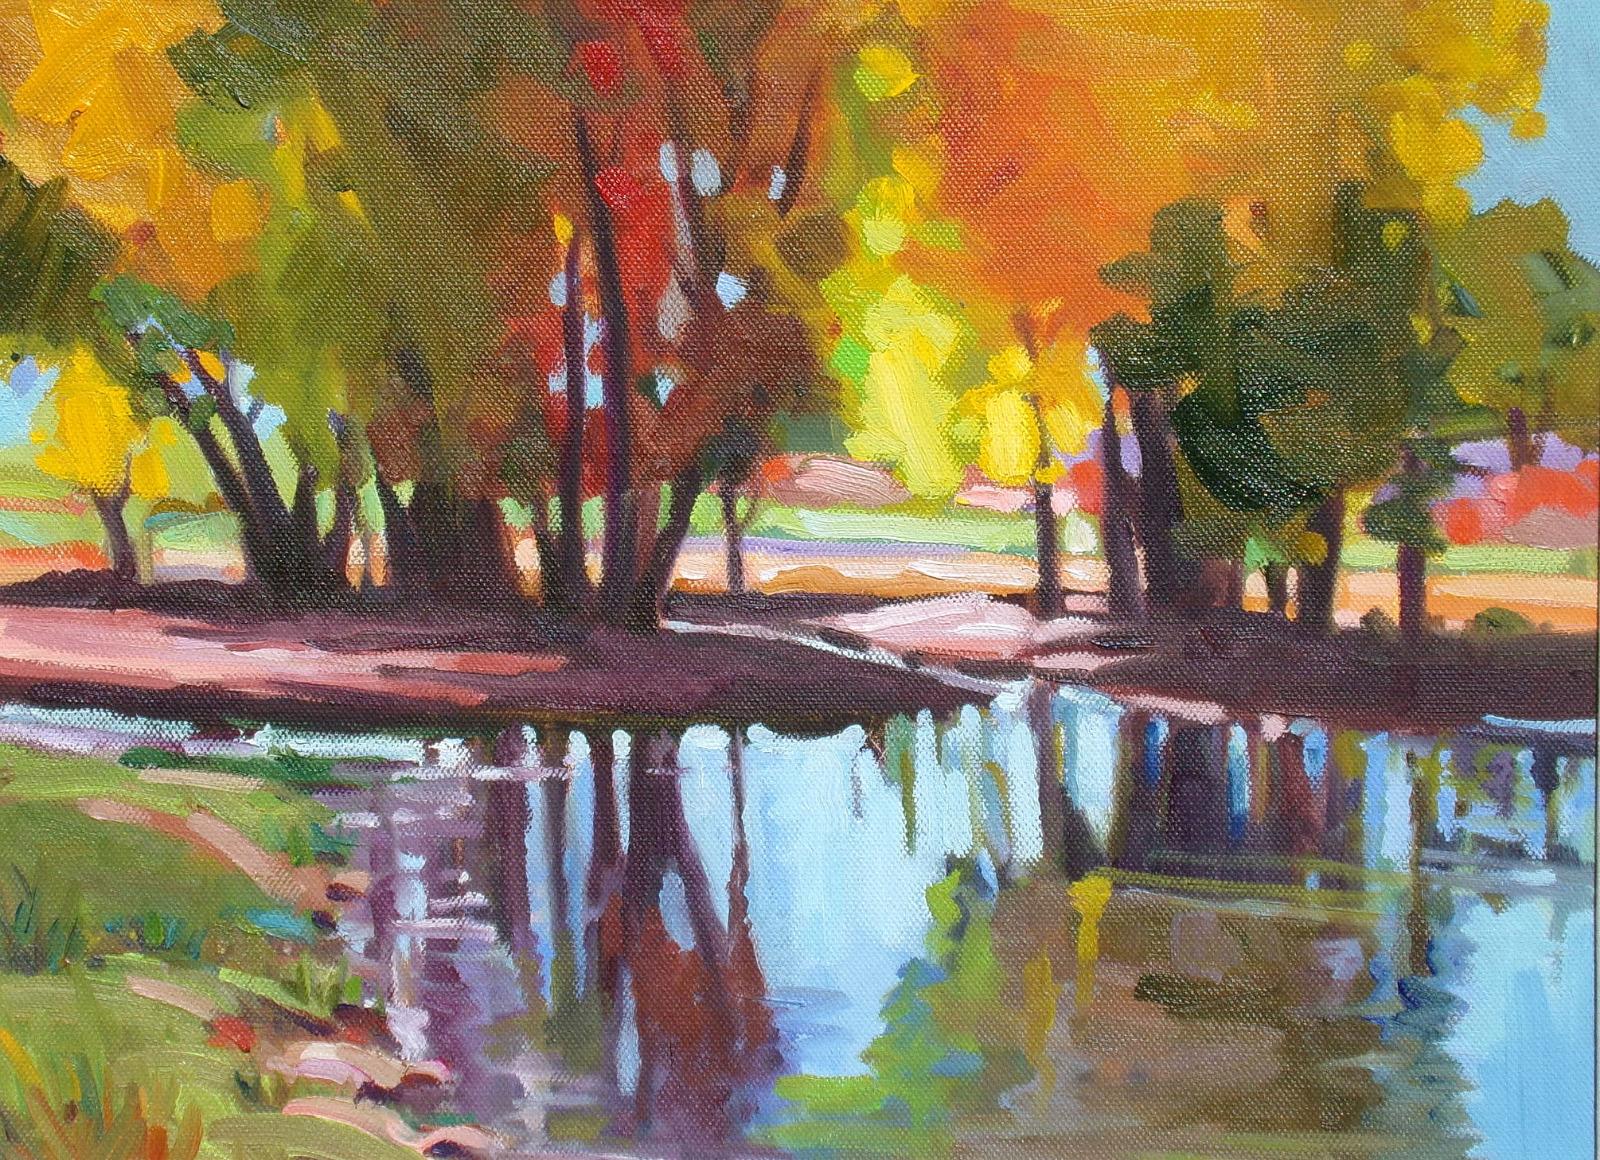 christine smith hudson garden reflections original oil